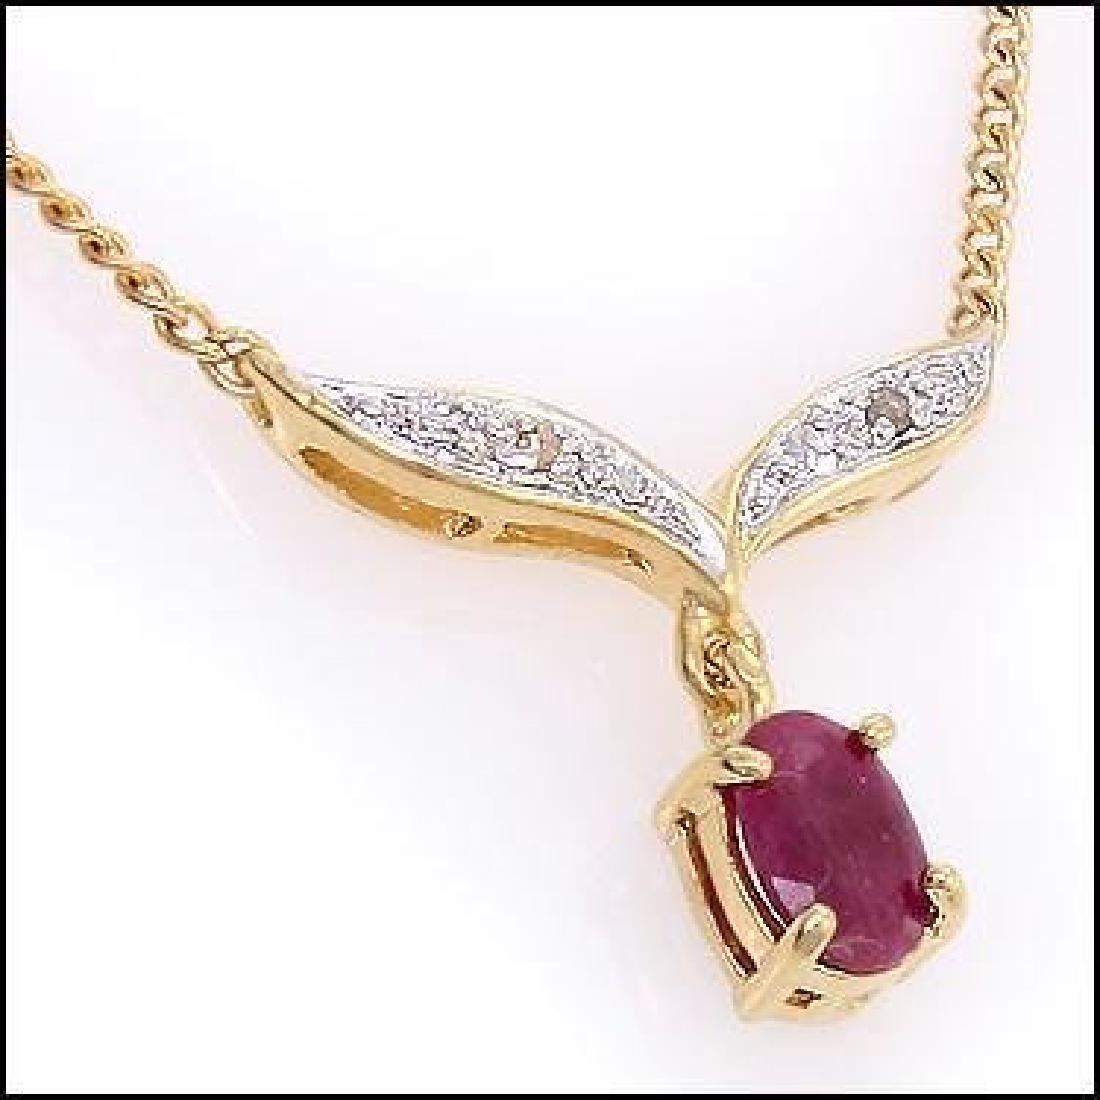 2.91 CT Ruby & Diamond Designer Necklace $855